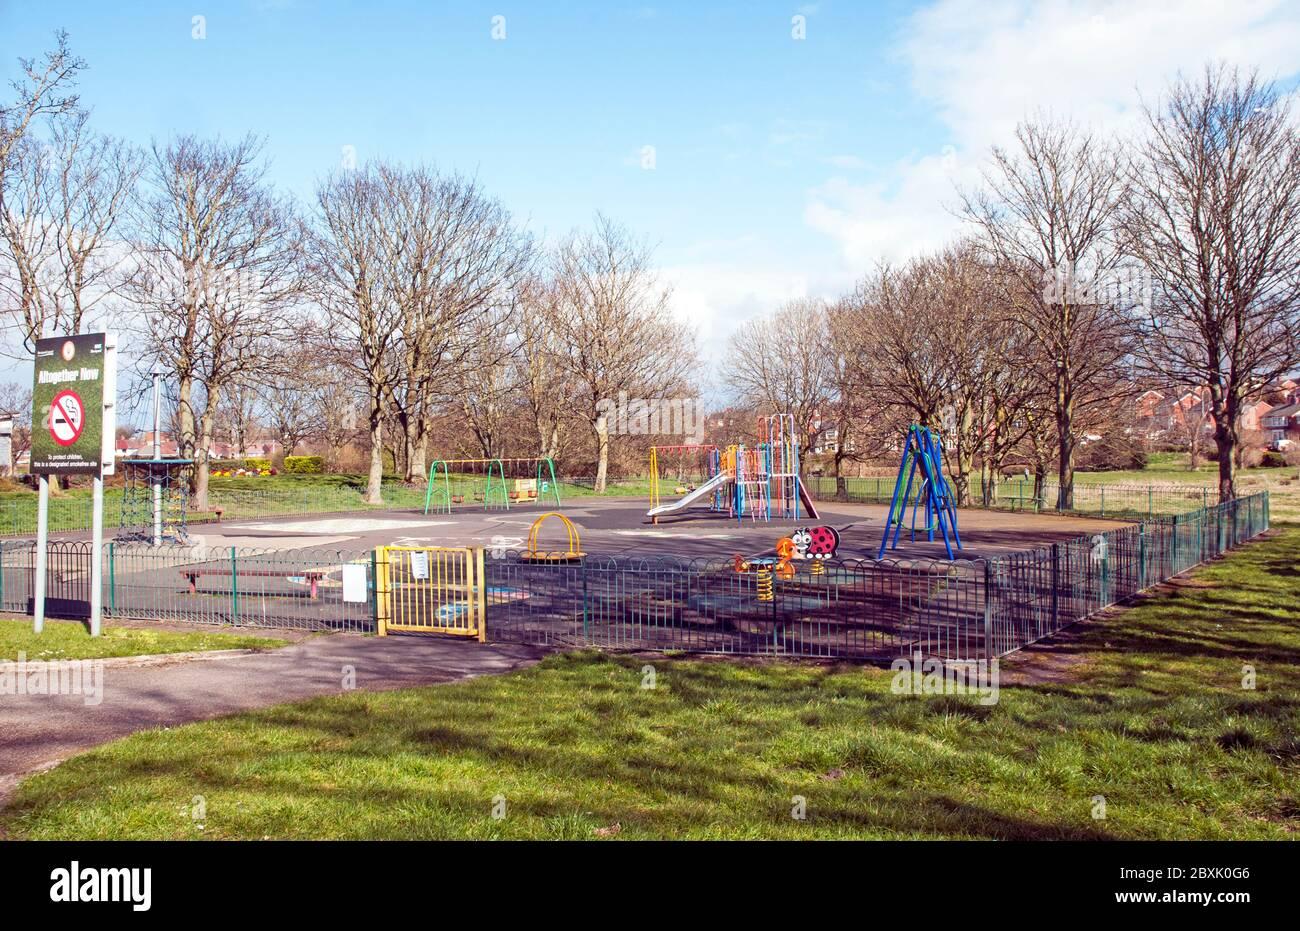 Kinderspielplatz geschlossen und verlassen, weil wegen Corona Virus covid 19 gesperrt. Kingscote Park Blackpool Lancashire England GB Stockfoto